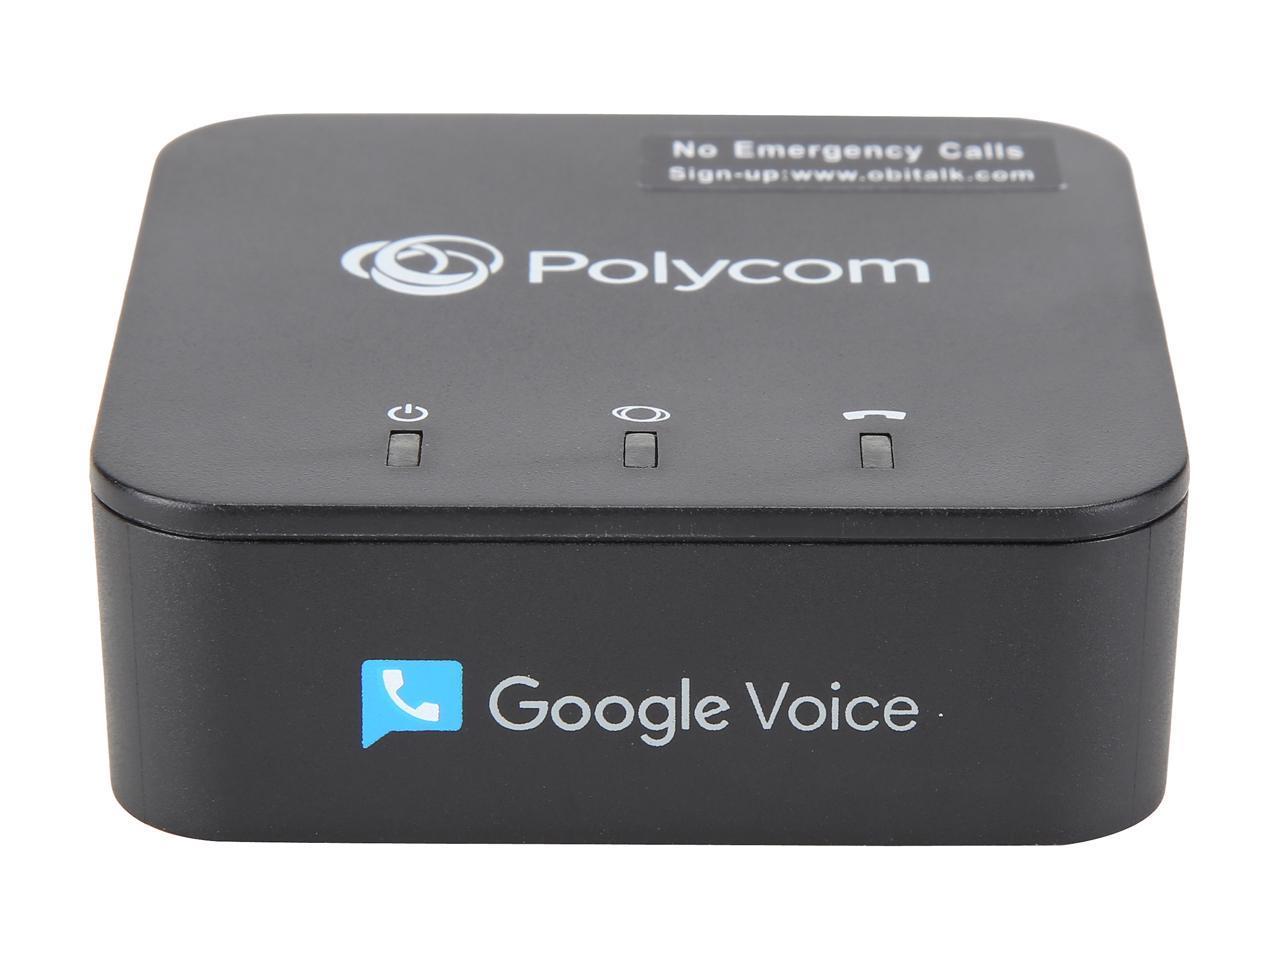 Polycom OBi200 VoIP Telephone Adapter @Newegg $40